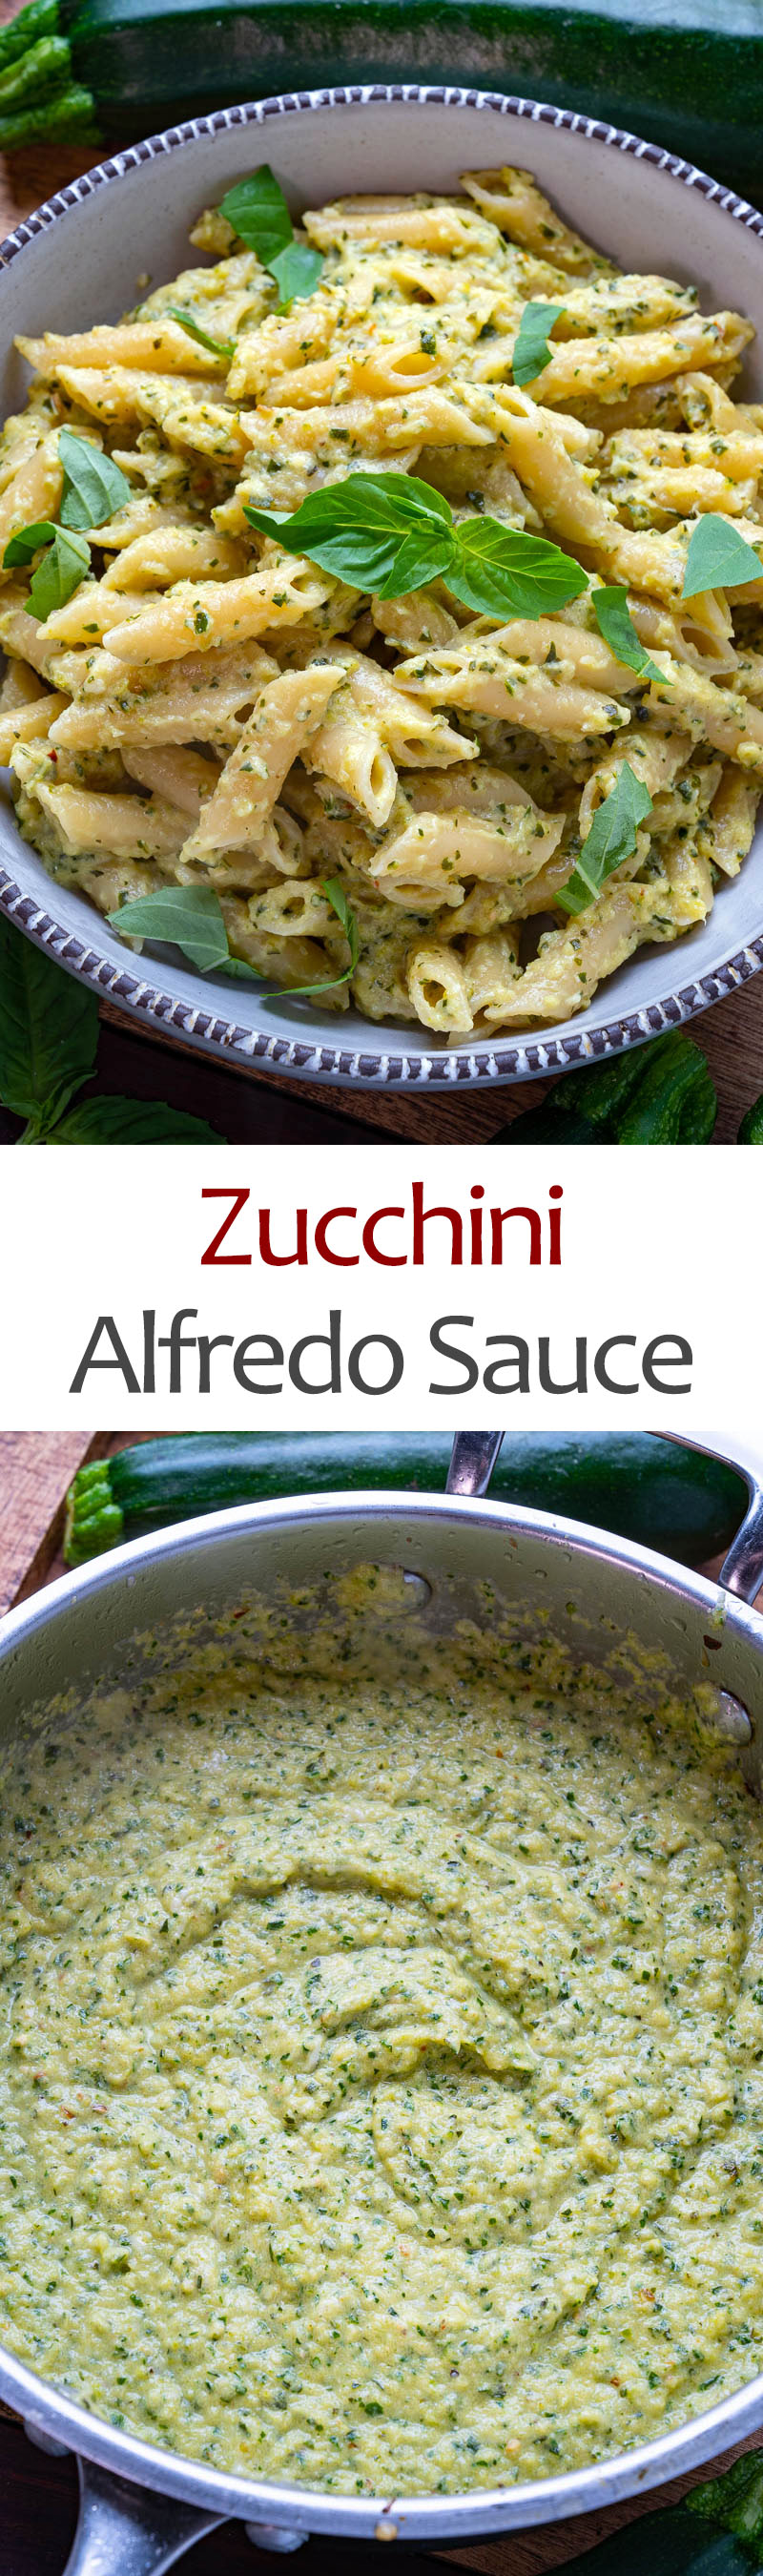 Zucchini Alfredo Sauce